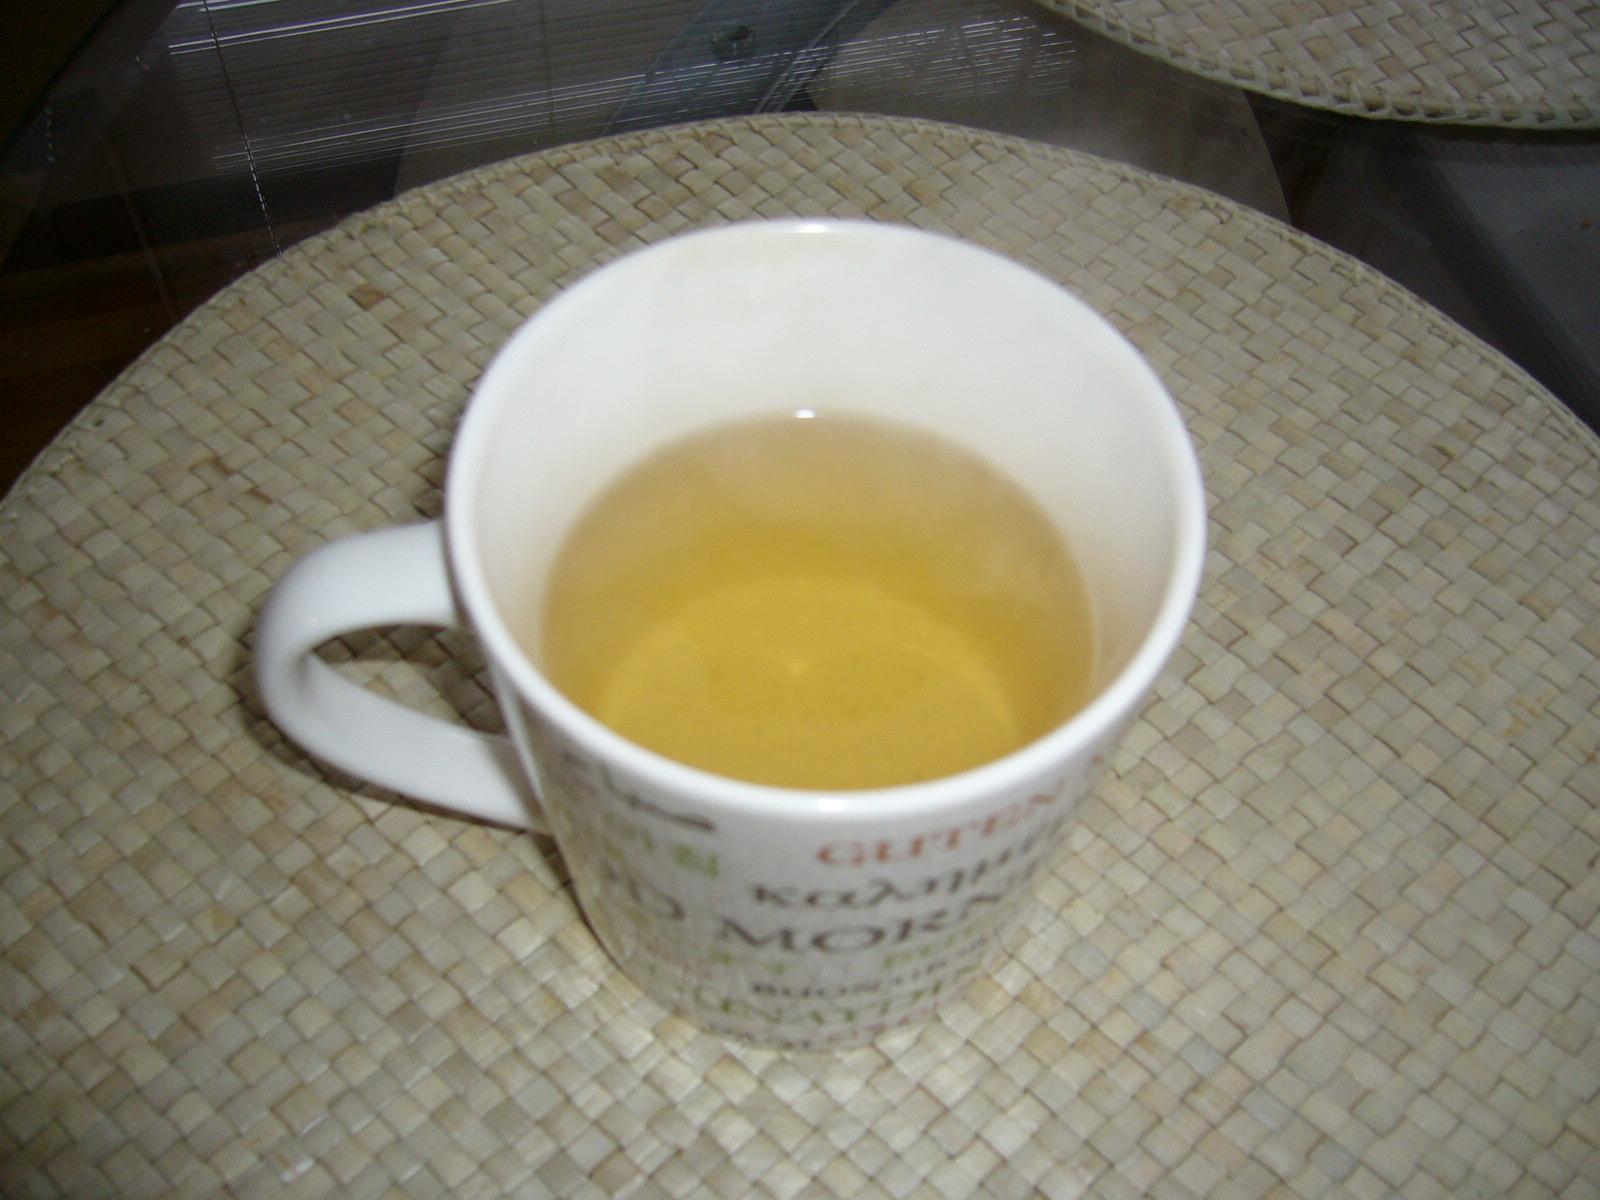 Polygonatum tea